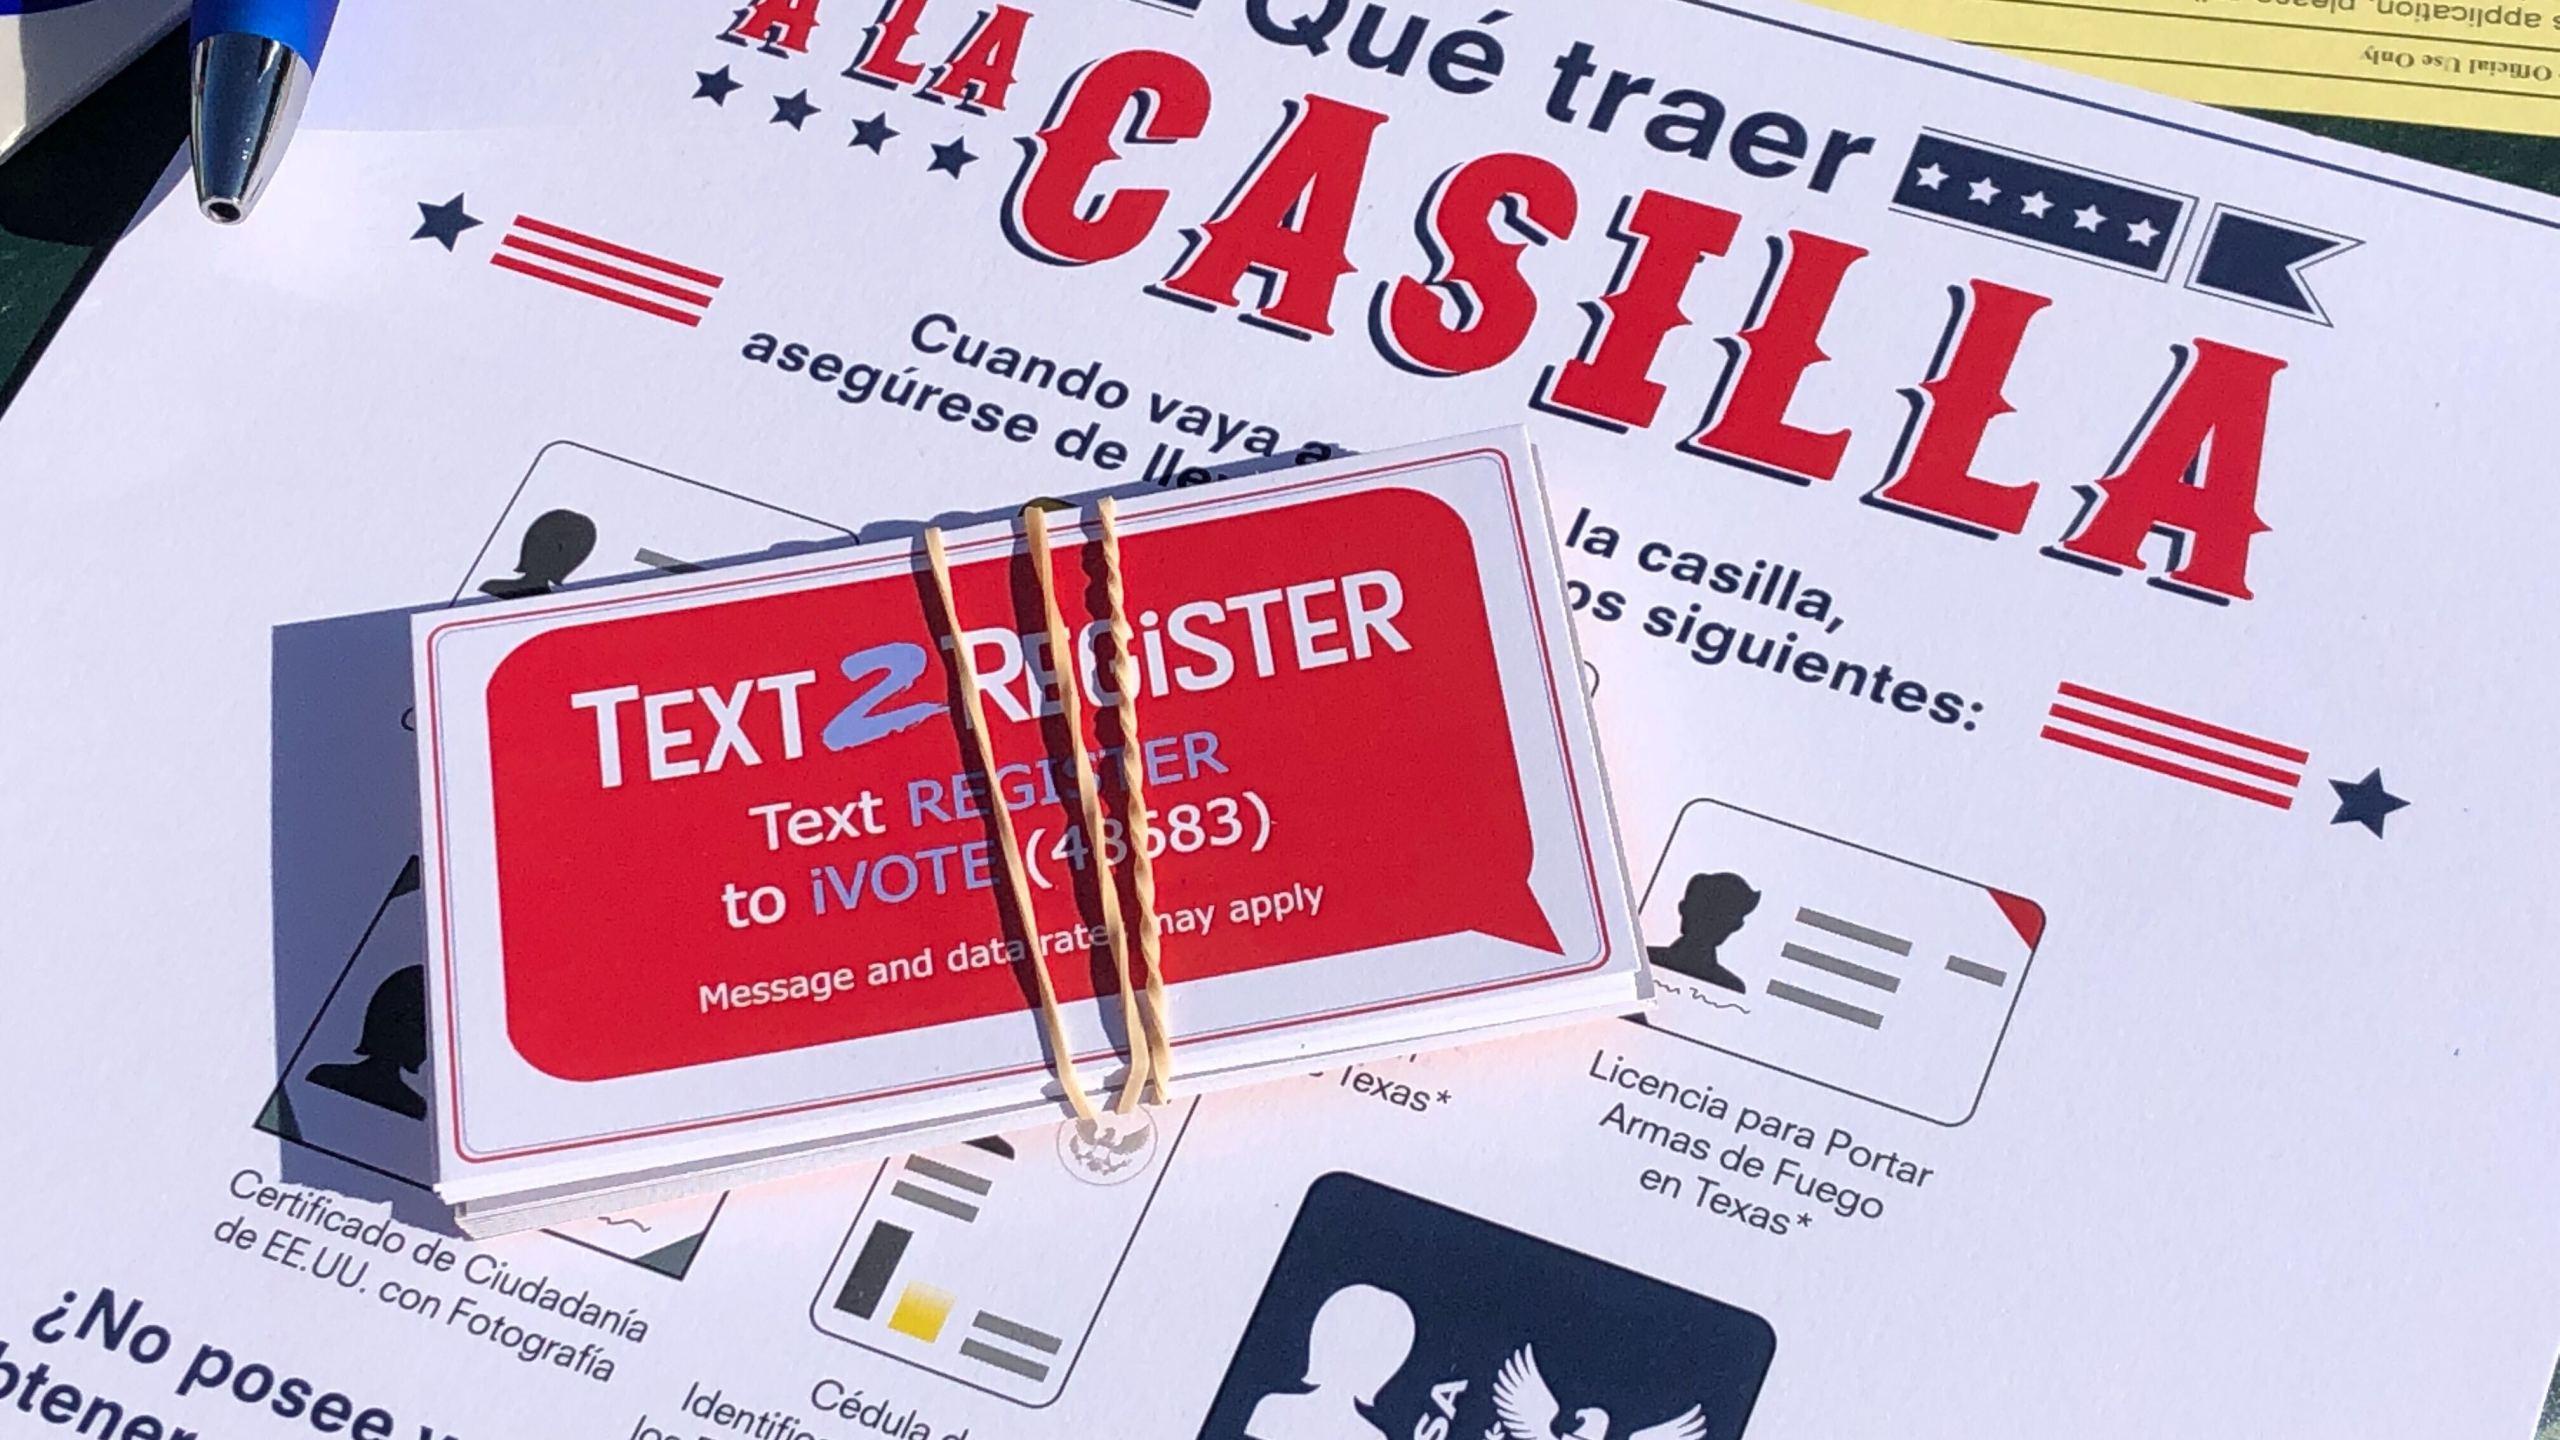 Drive-thru voter registration event in south Austin Sept. 29 (KXAN Photo/Frank Martinez)